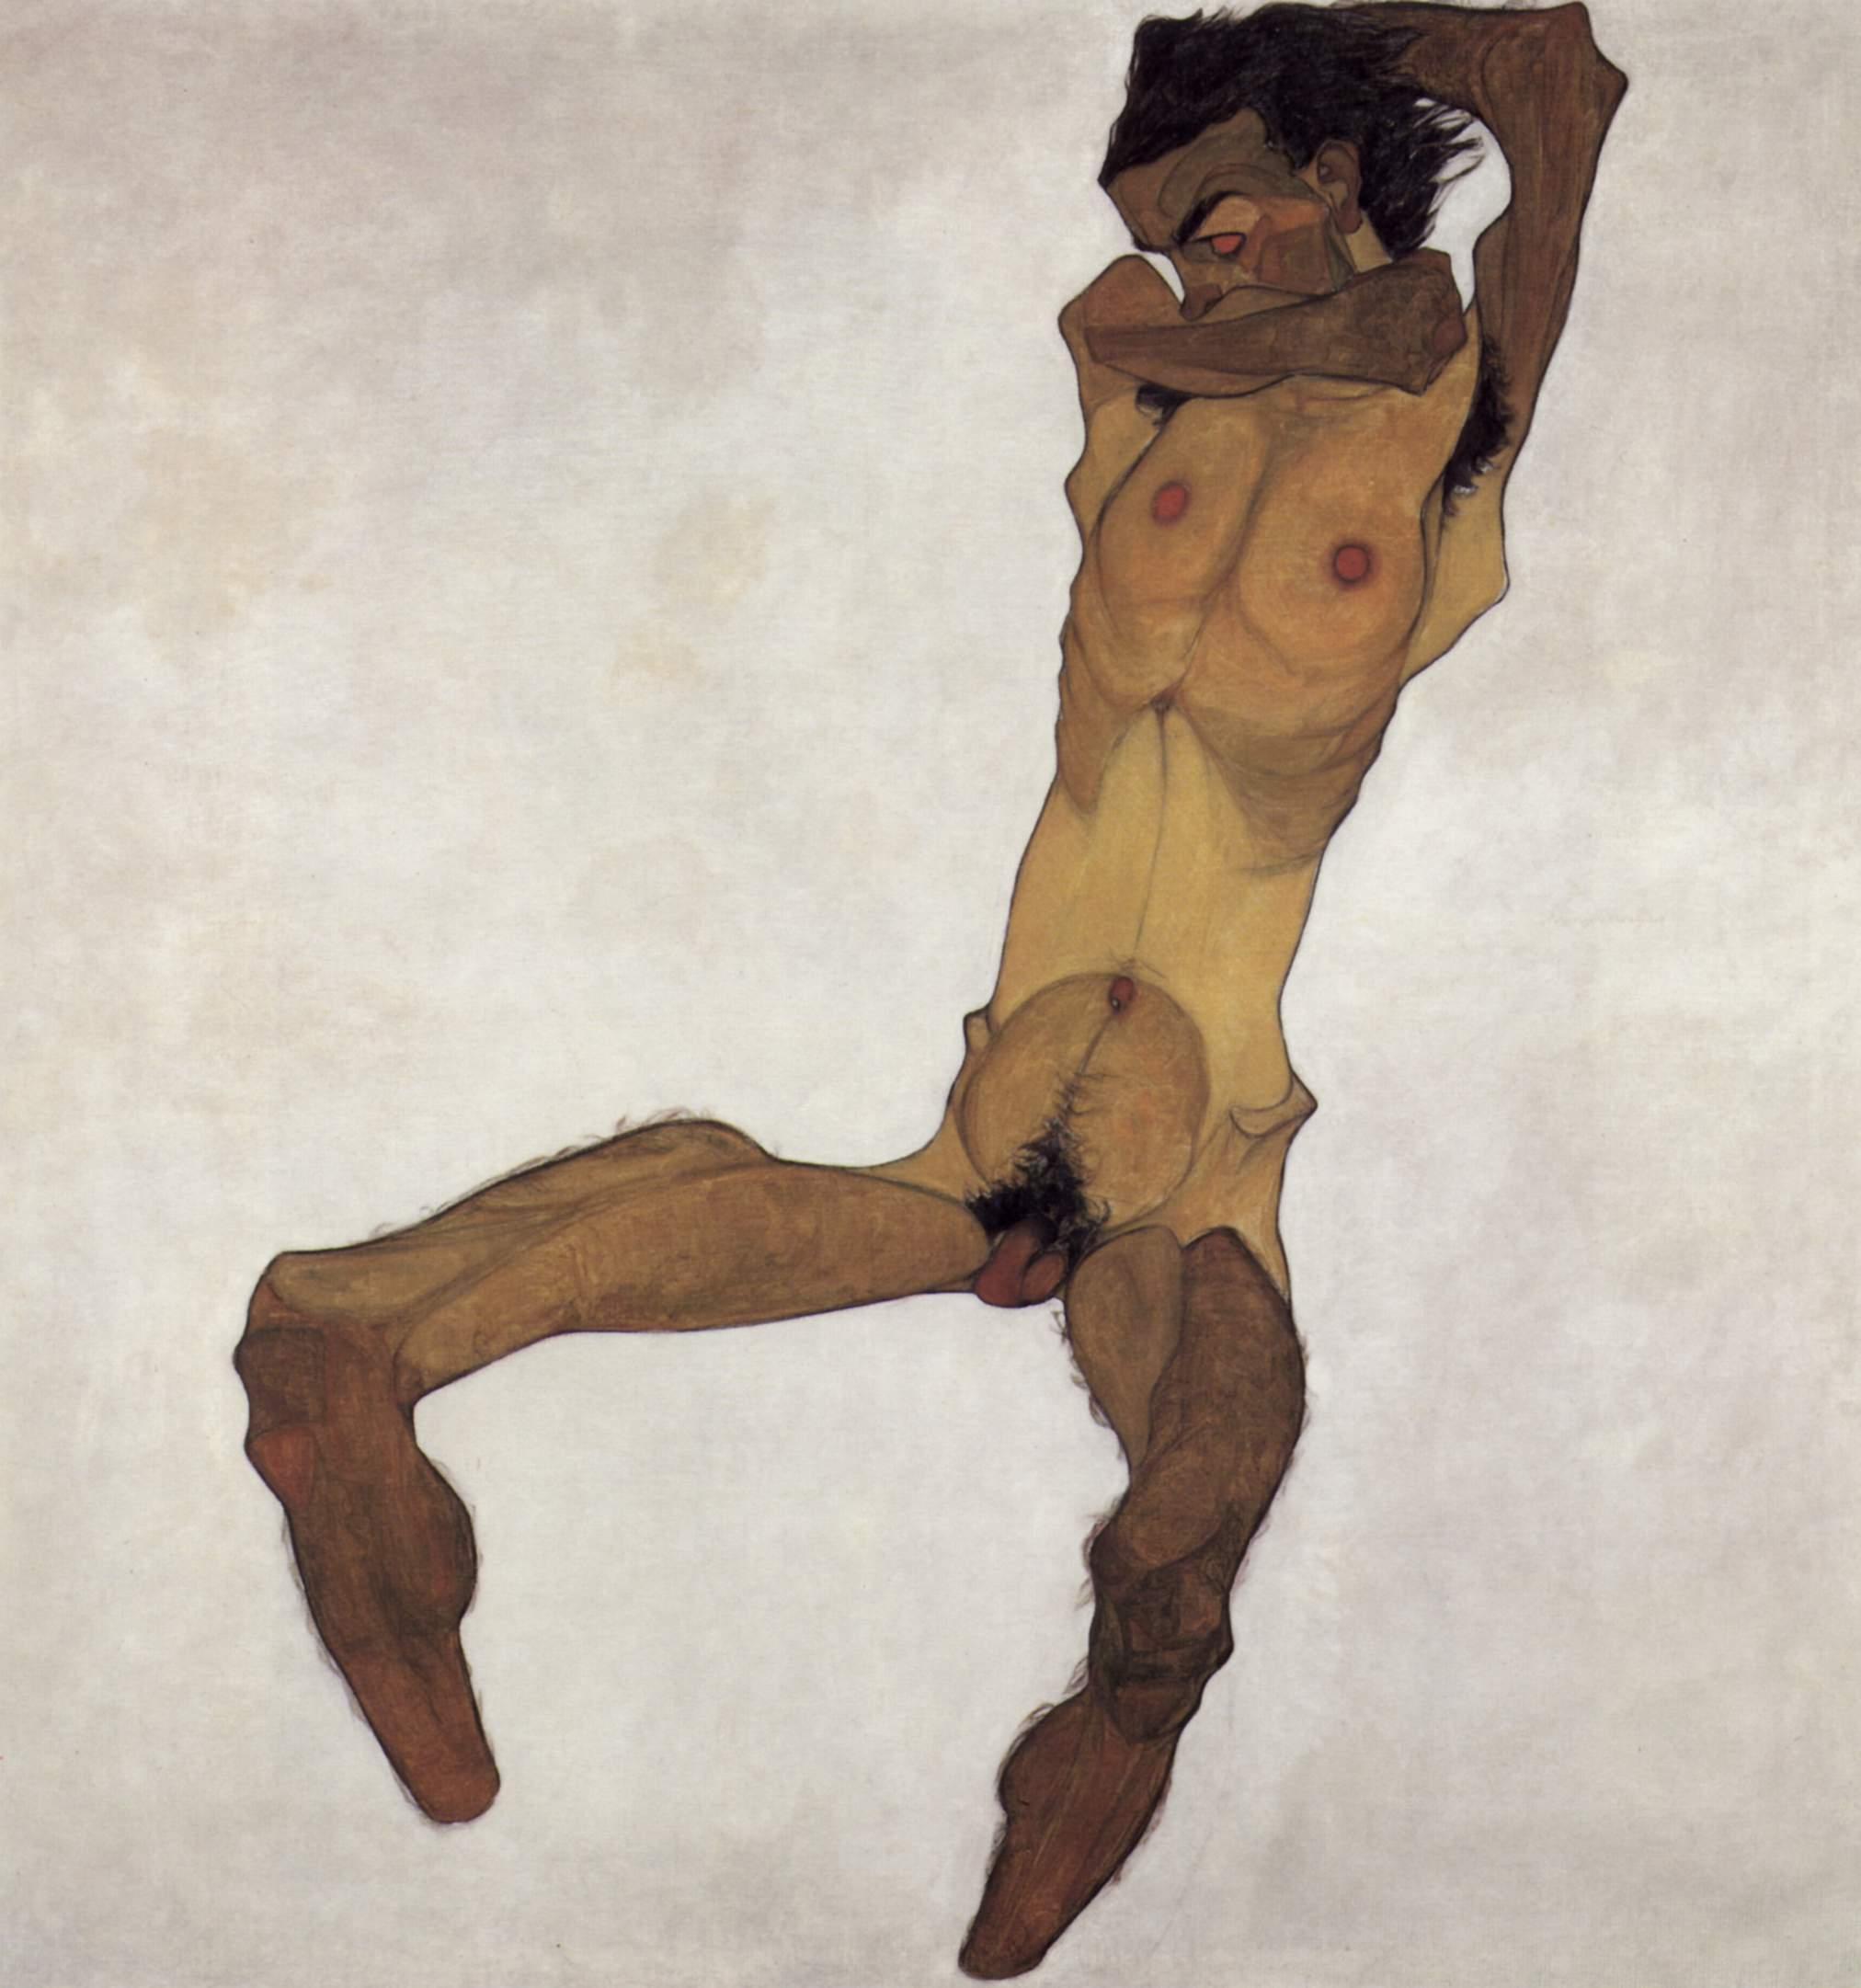 File:Egon Schiele 083.jpg - Wikimedia Commons